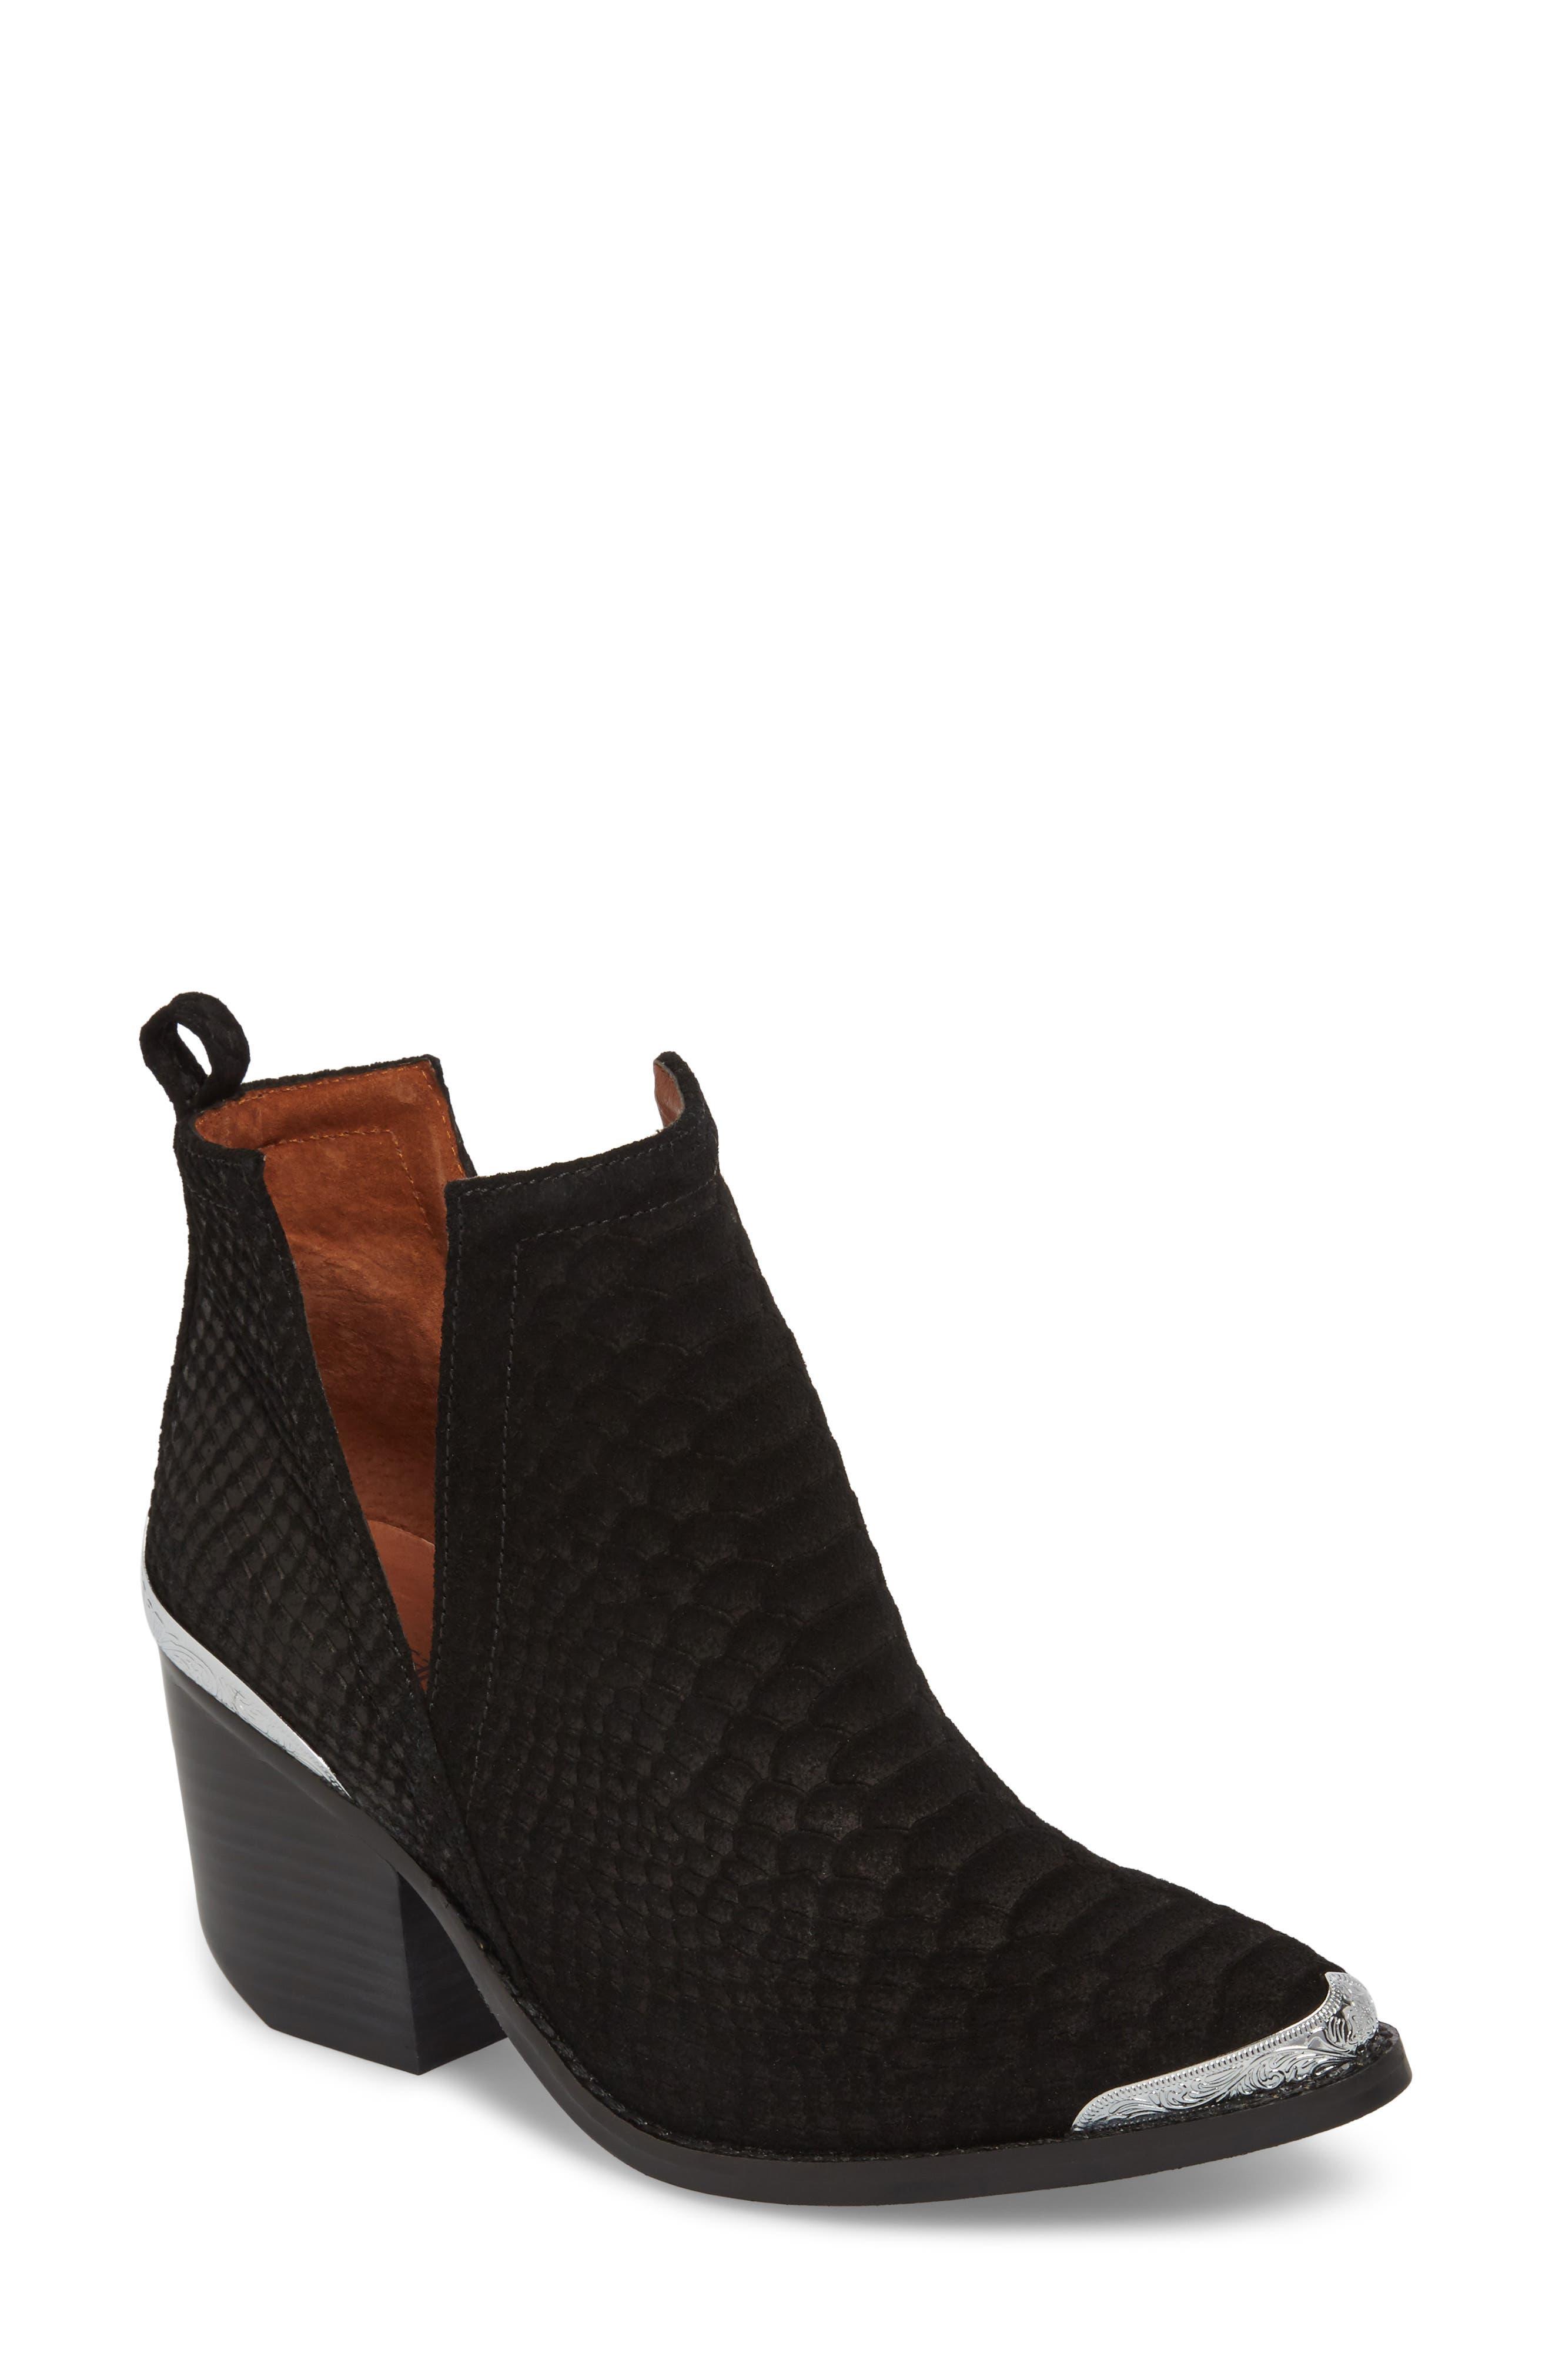 Boots Women Two Lips Sleek Boot Brown Get Online